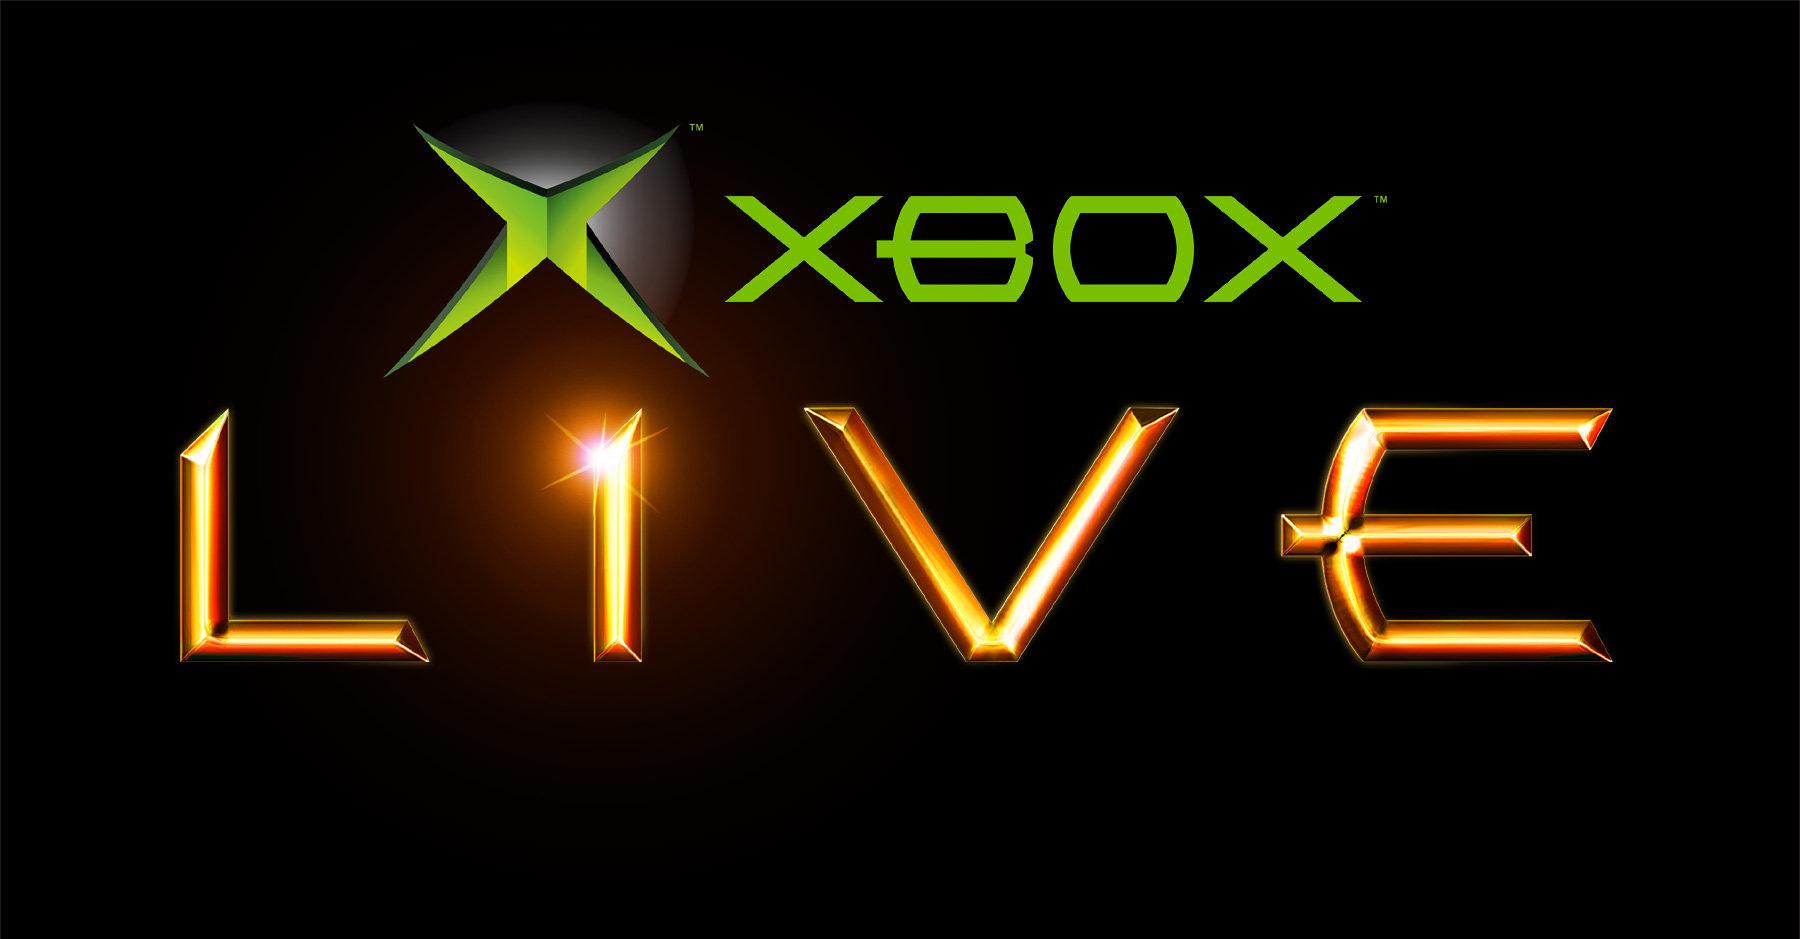 De færreste trenger to Xbox Live-abonnementer...